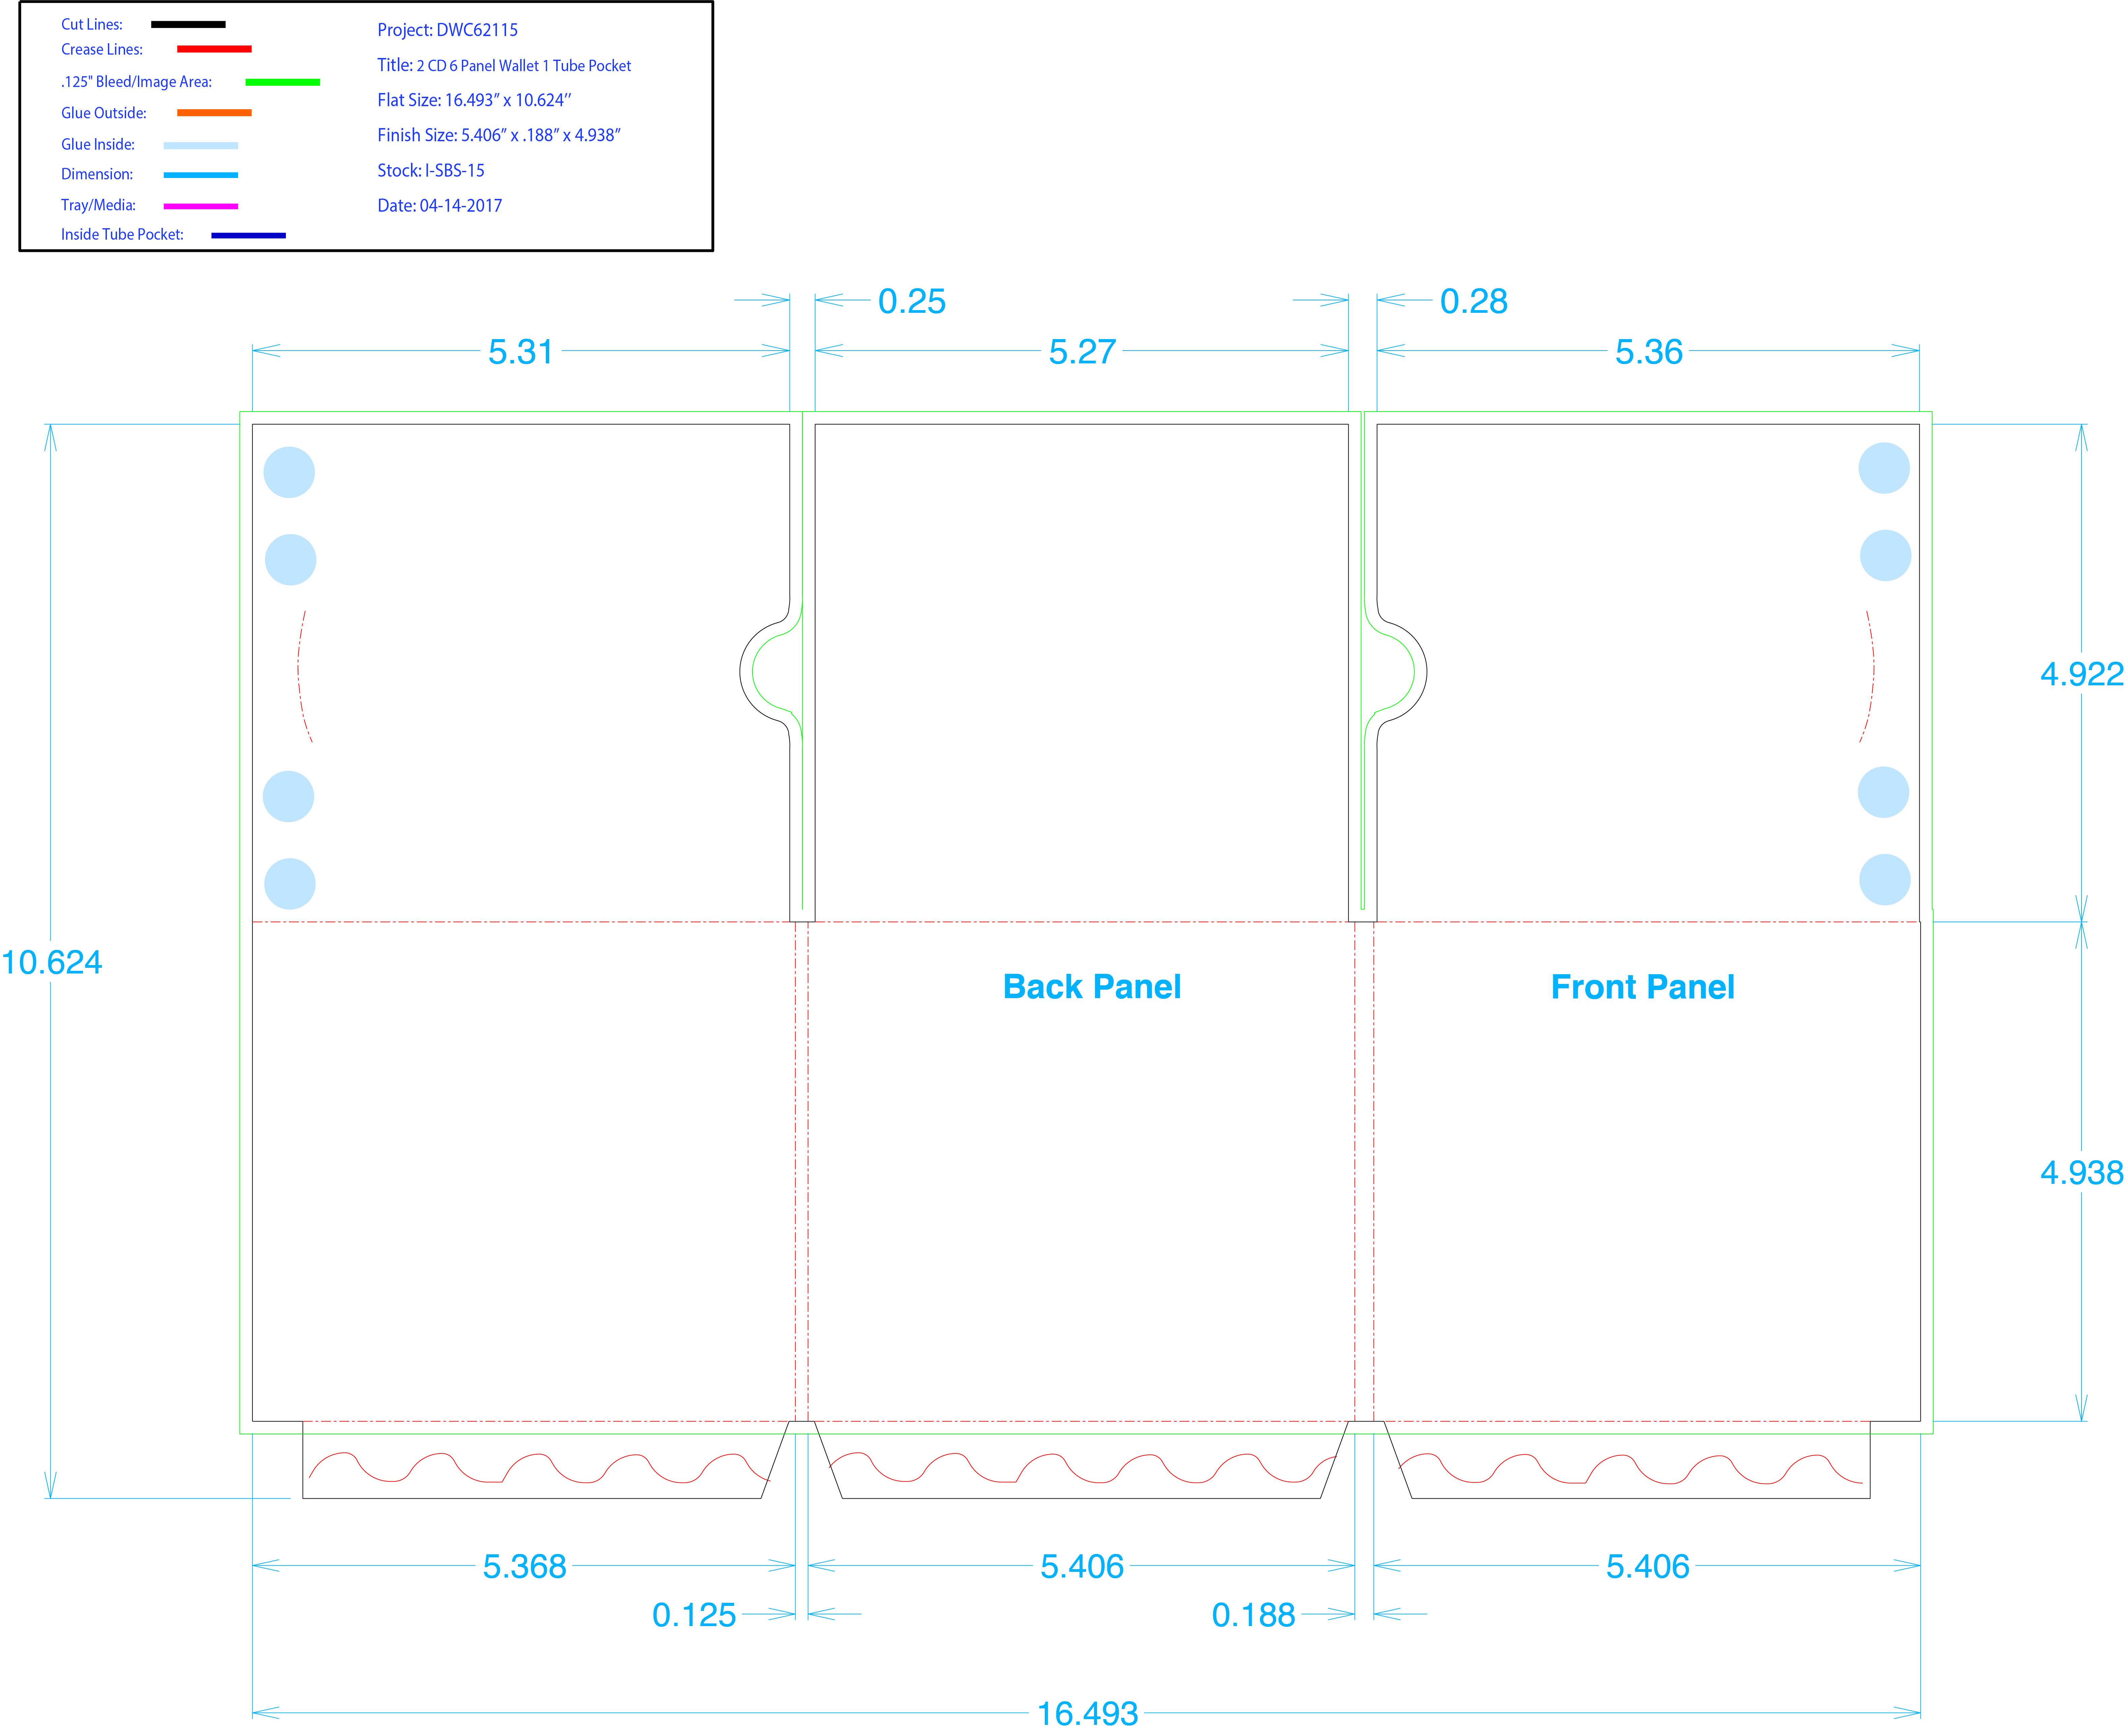 DWC62114 - 2 CD Pkts w/Thumb Notch, 1 Tube Pocket